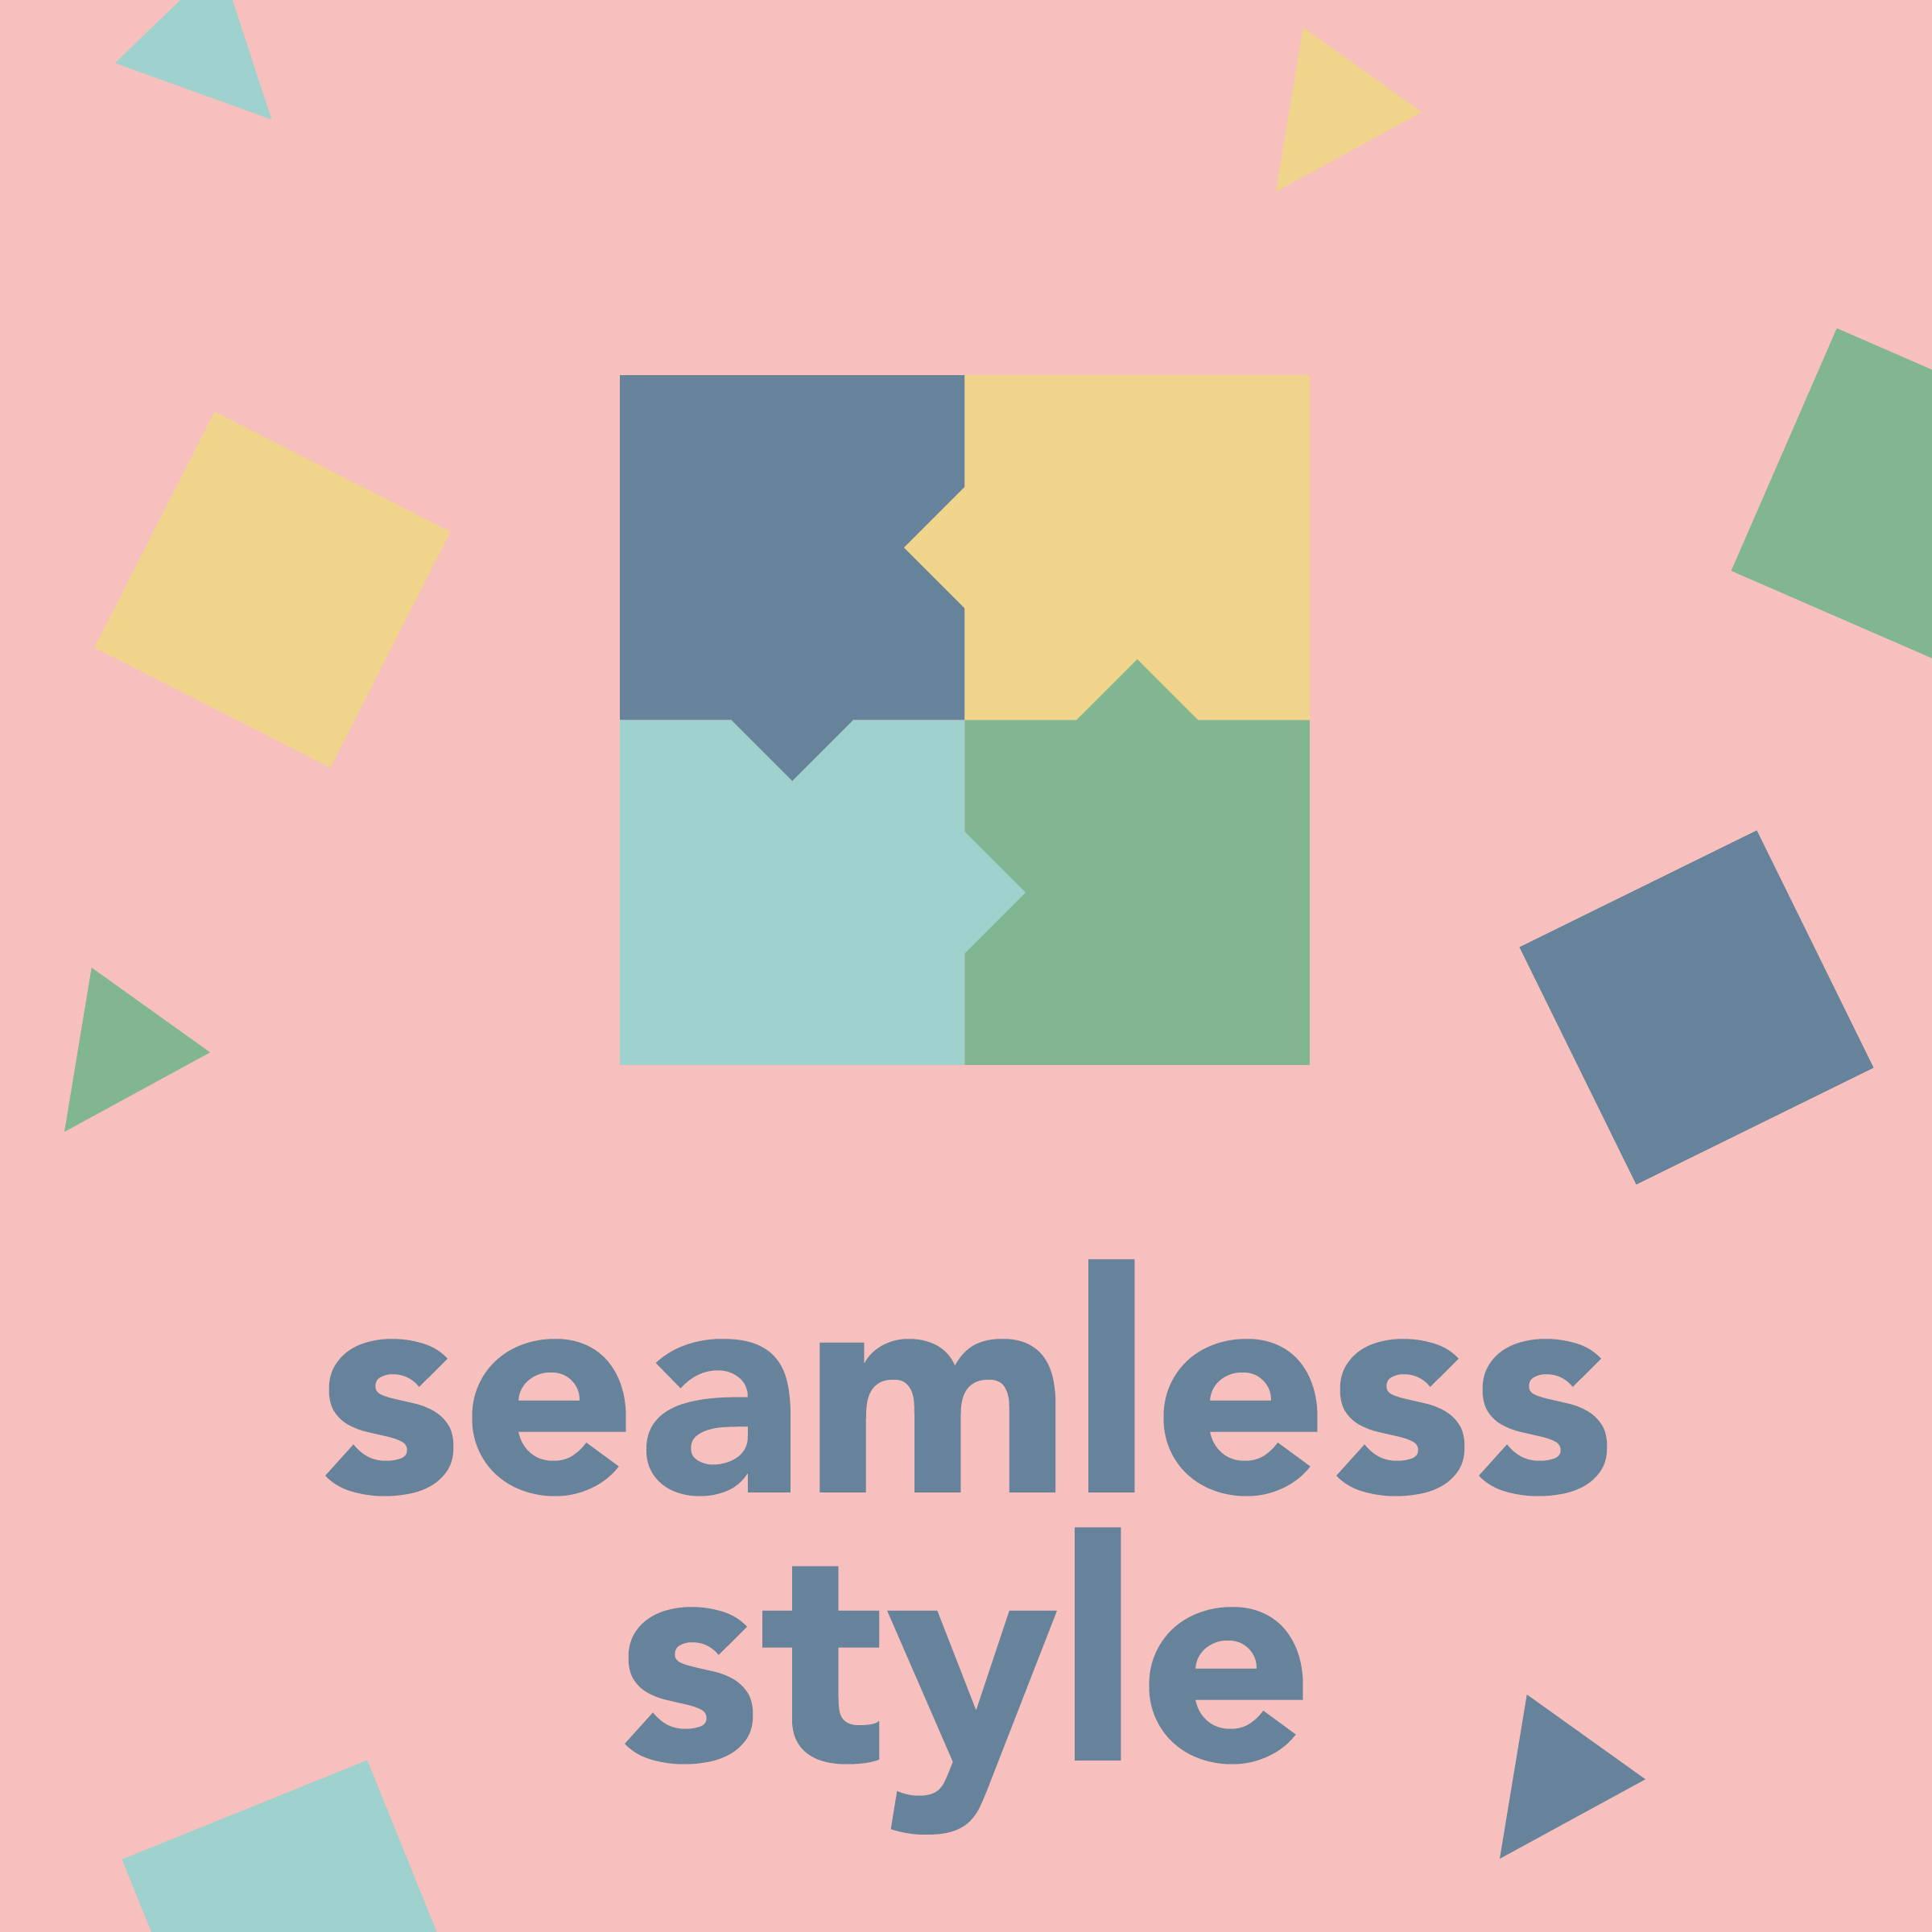 seamless style